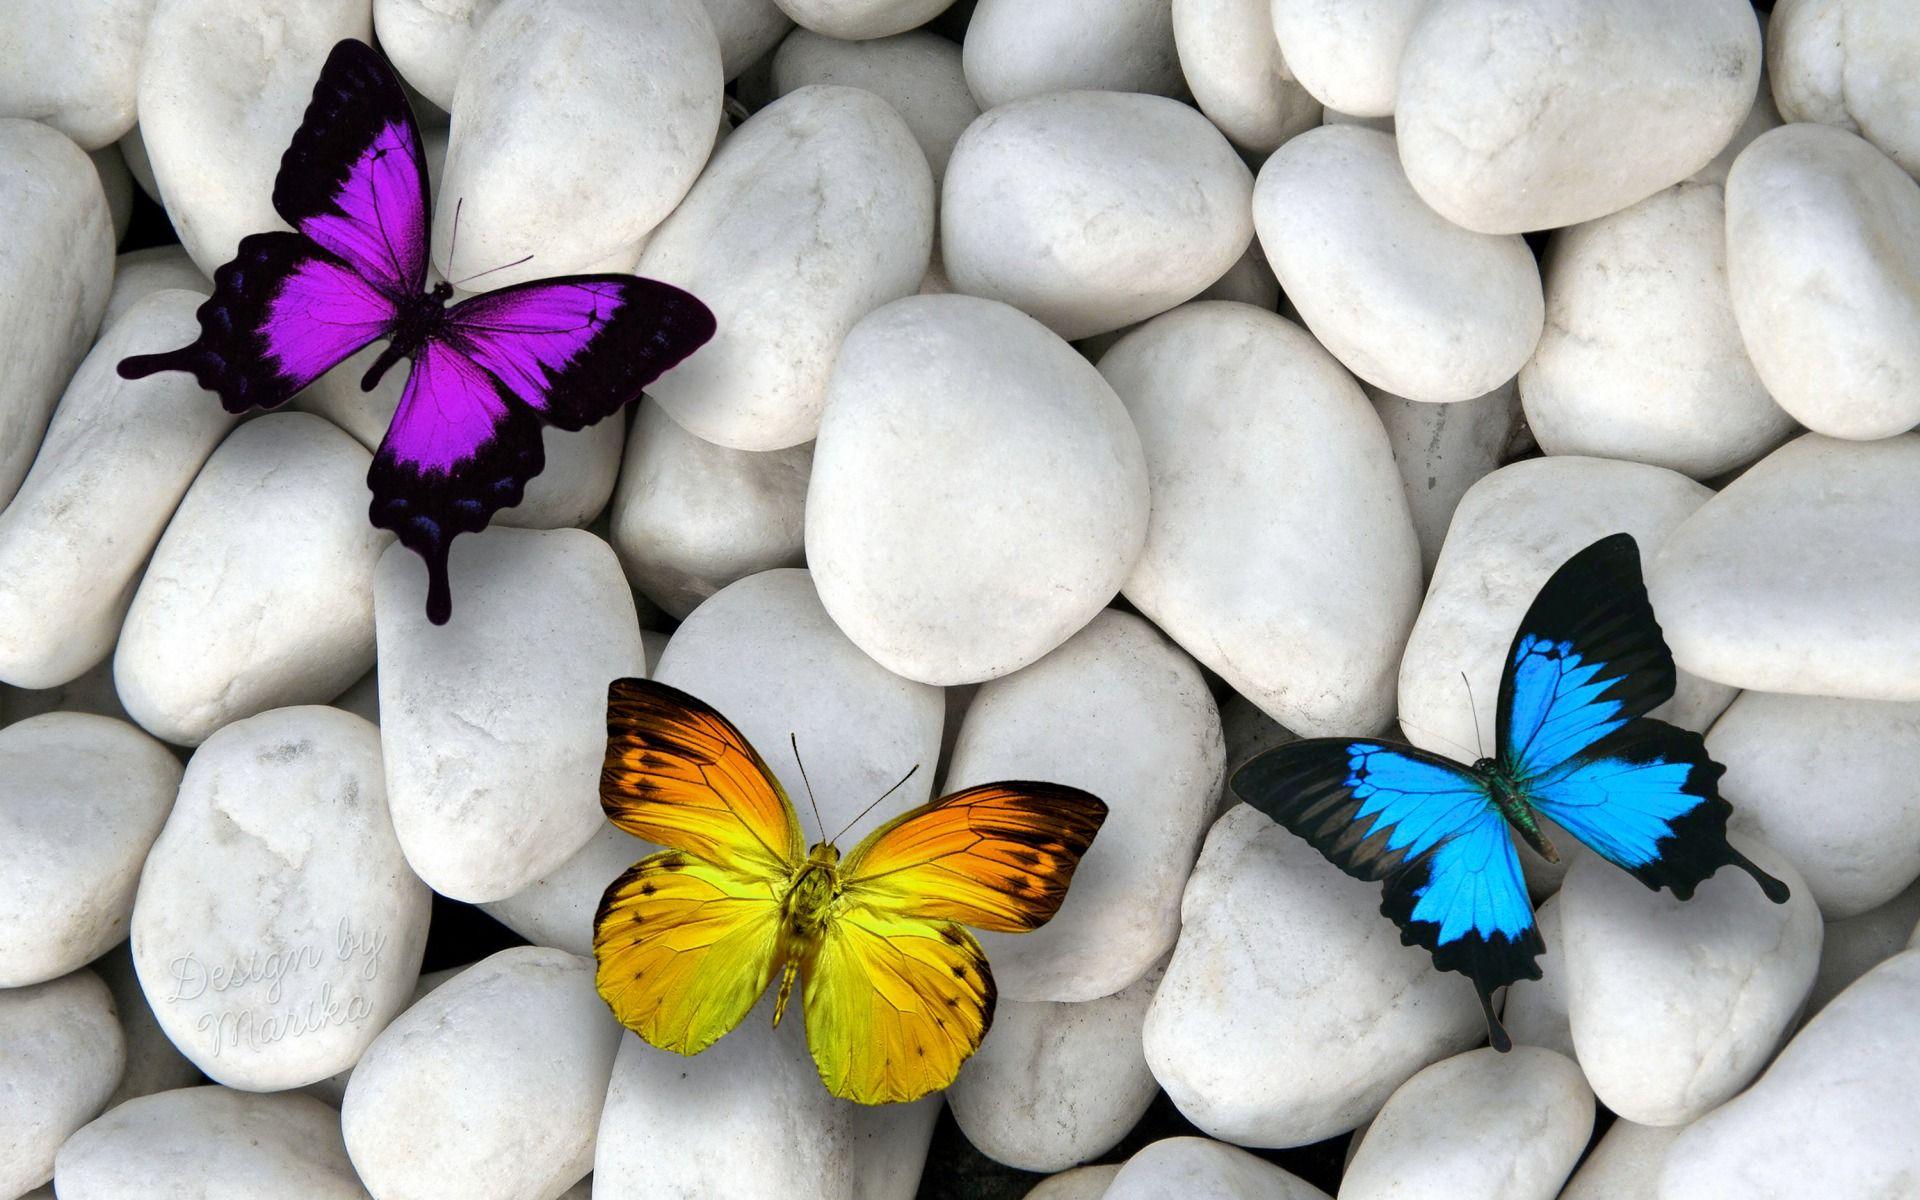 Blue butterfly wallpaper background 1024768 blue butterfly blue butterfly wallpaper background 1024768 blue butterfly wallpapers 46 wallpapers adorable buycottarizona